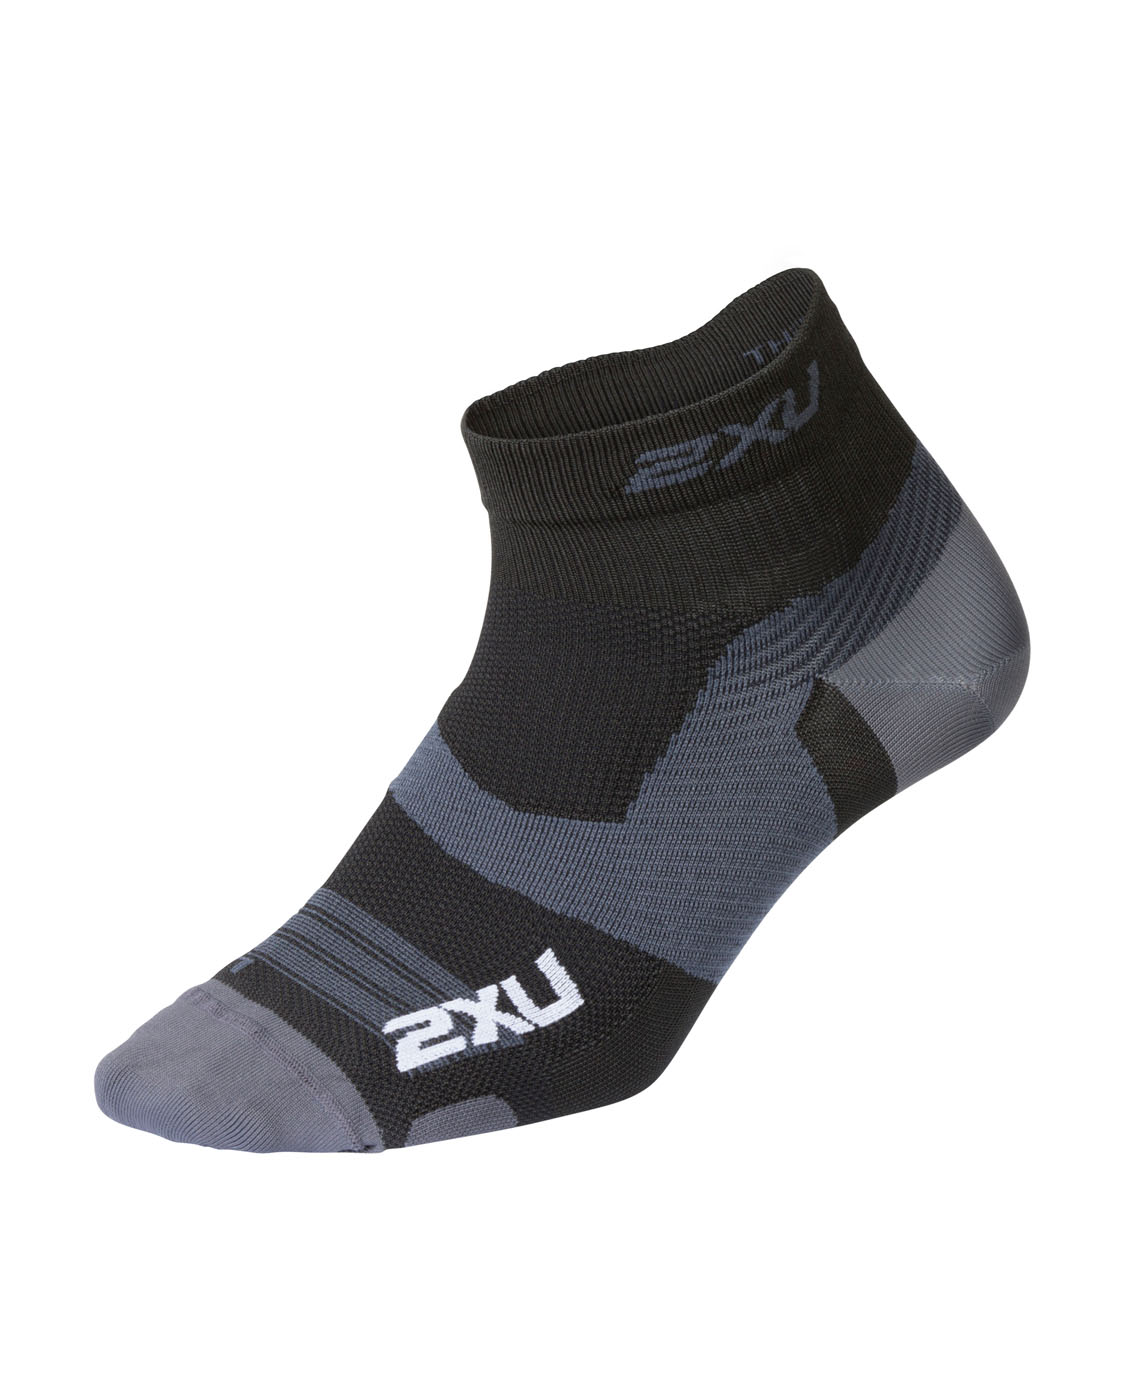 2XU Unisex Vectr Ultralight 1/4 Crew Sock - Black/Titanium